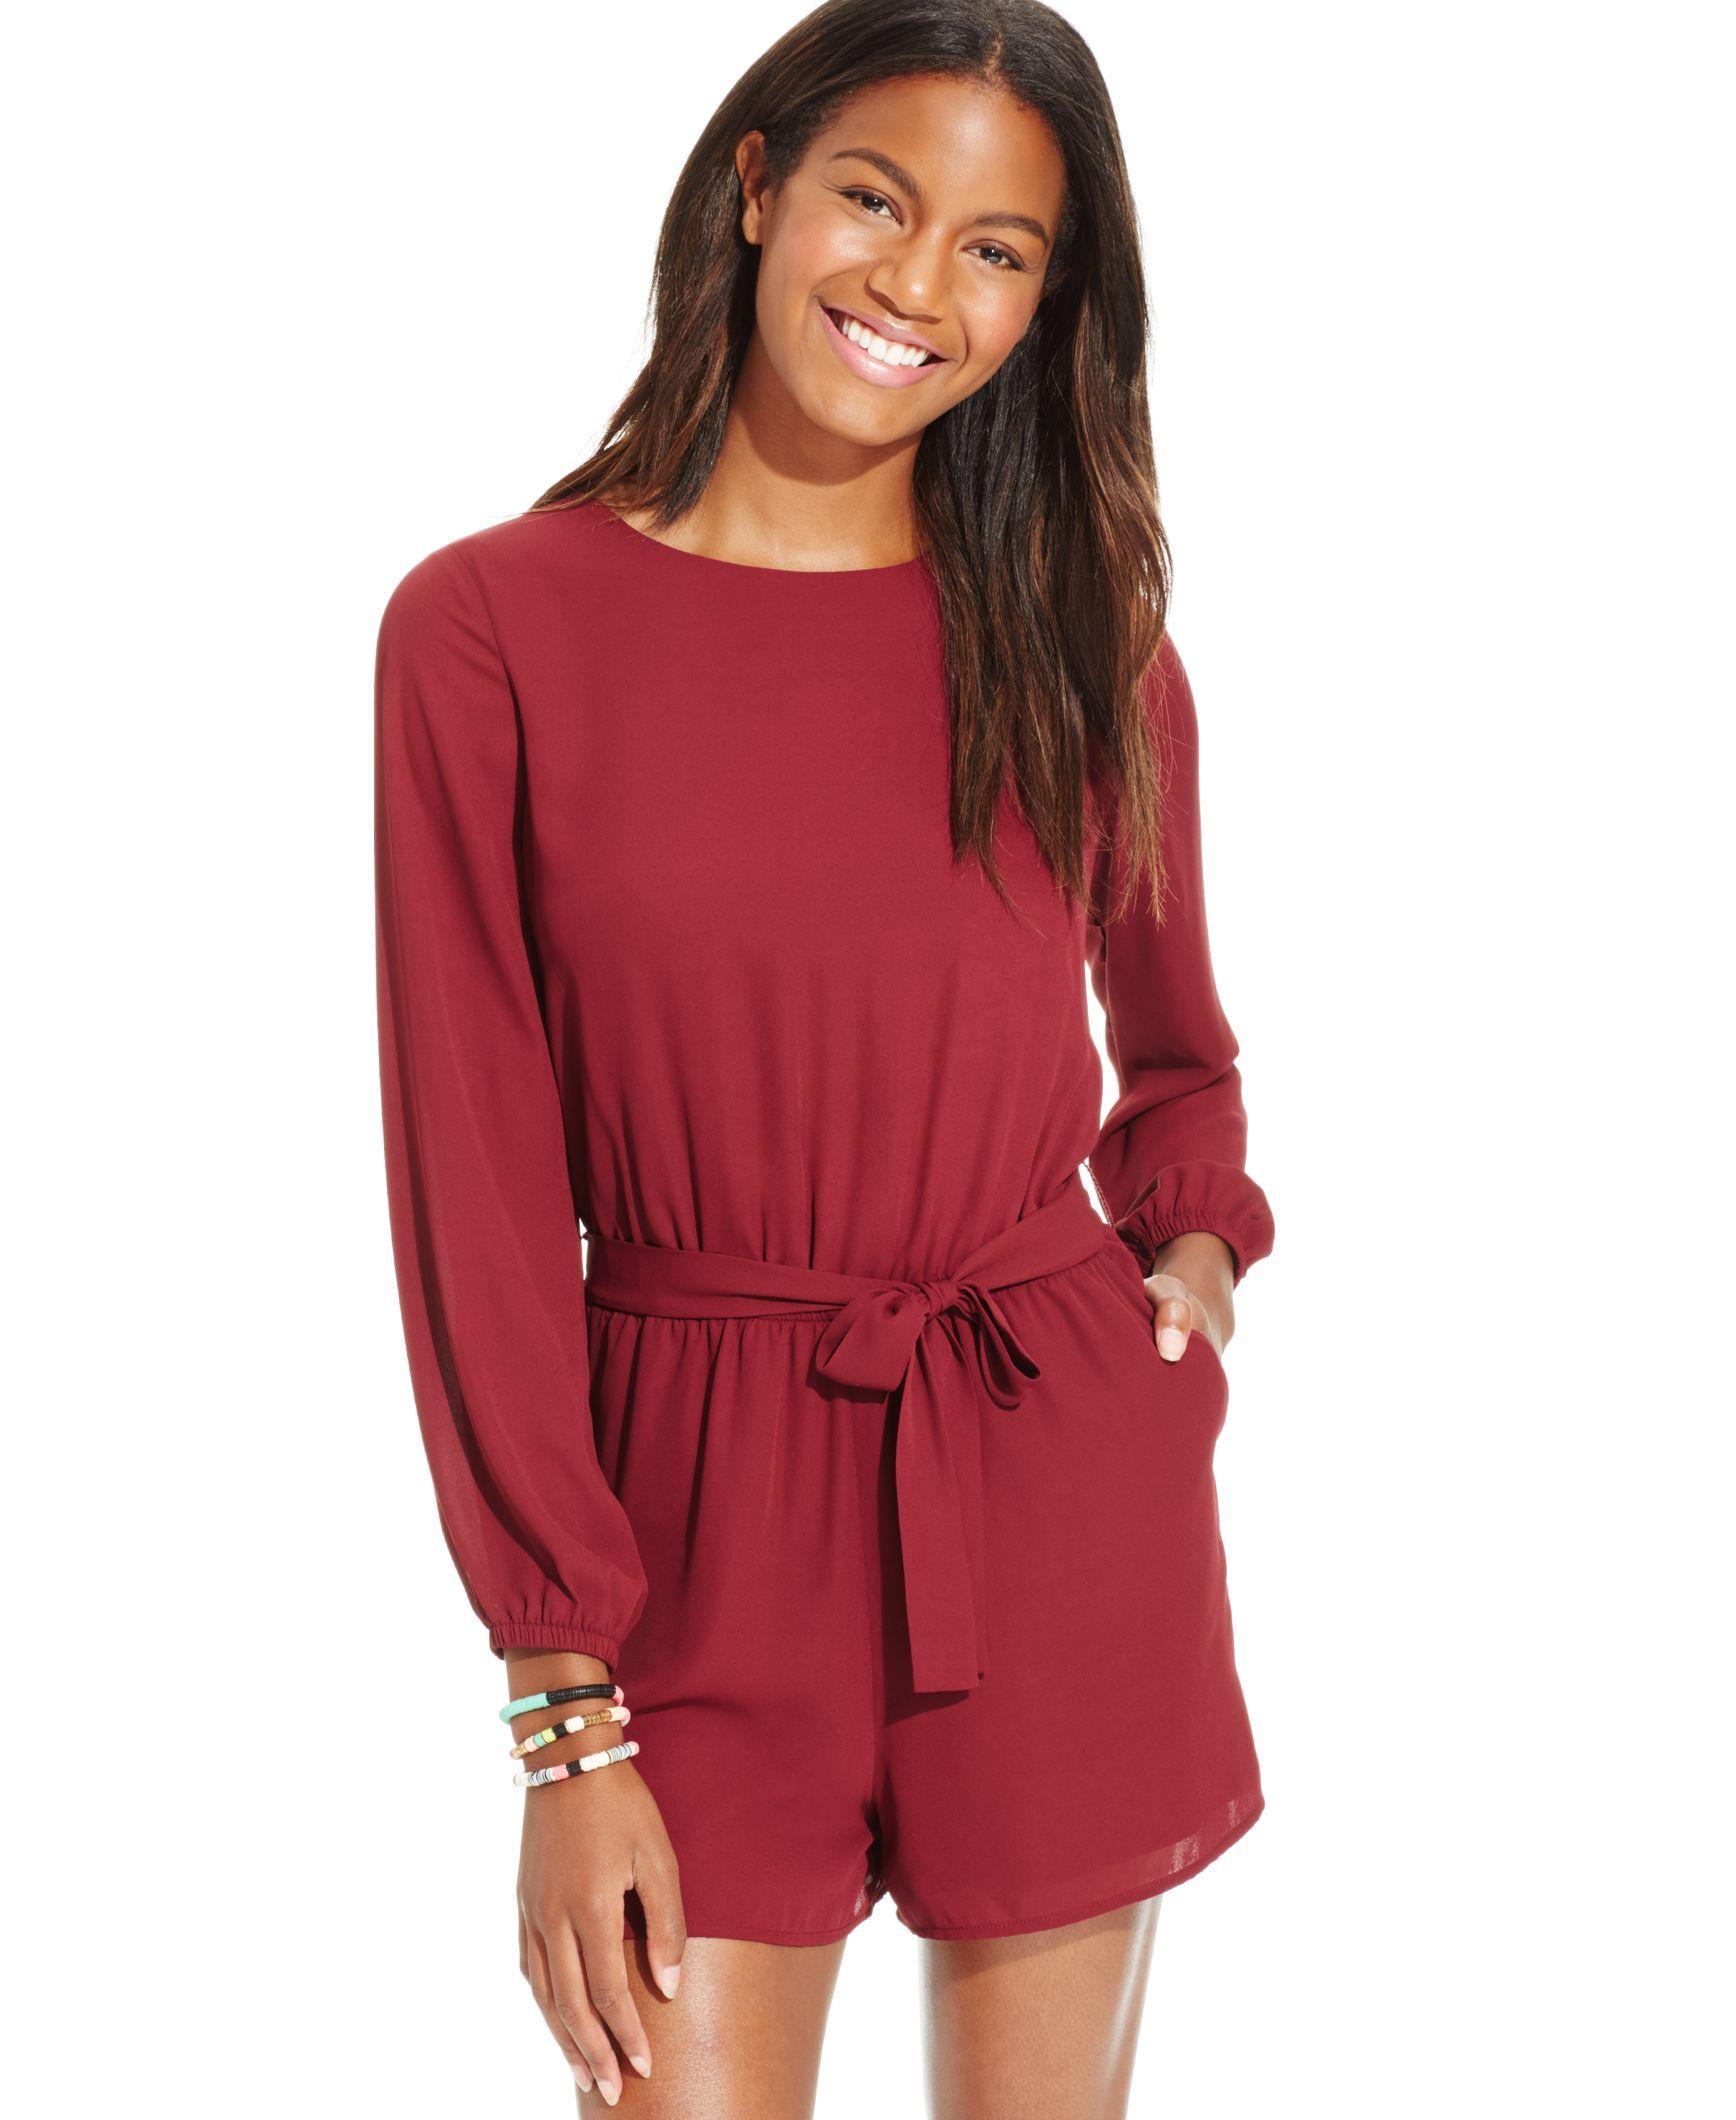 91bcb3816b44 One Clothing Juniorsu0026 39  Long-Sleeve Sash Romper - Juniors .